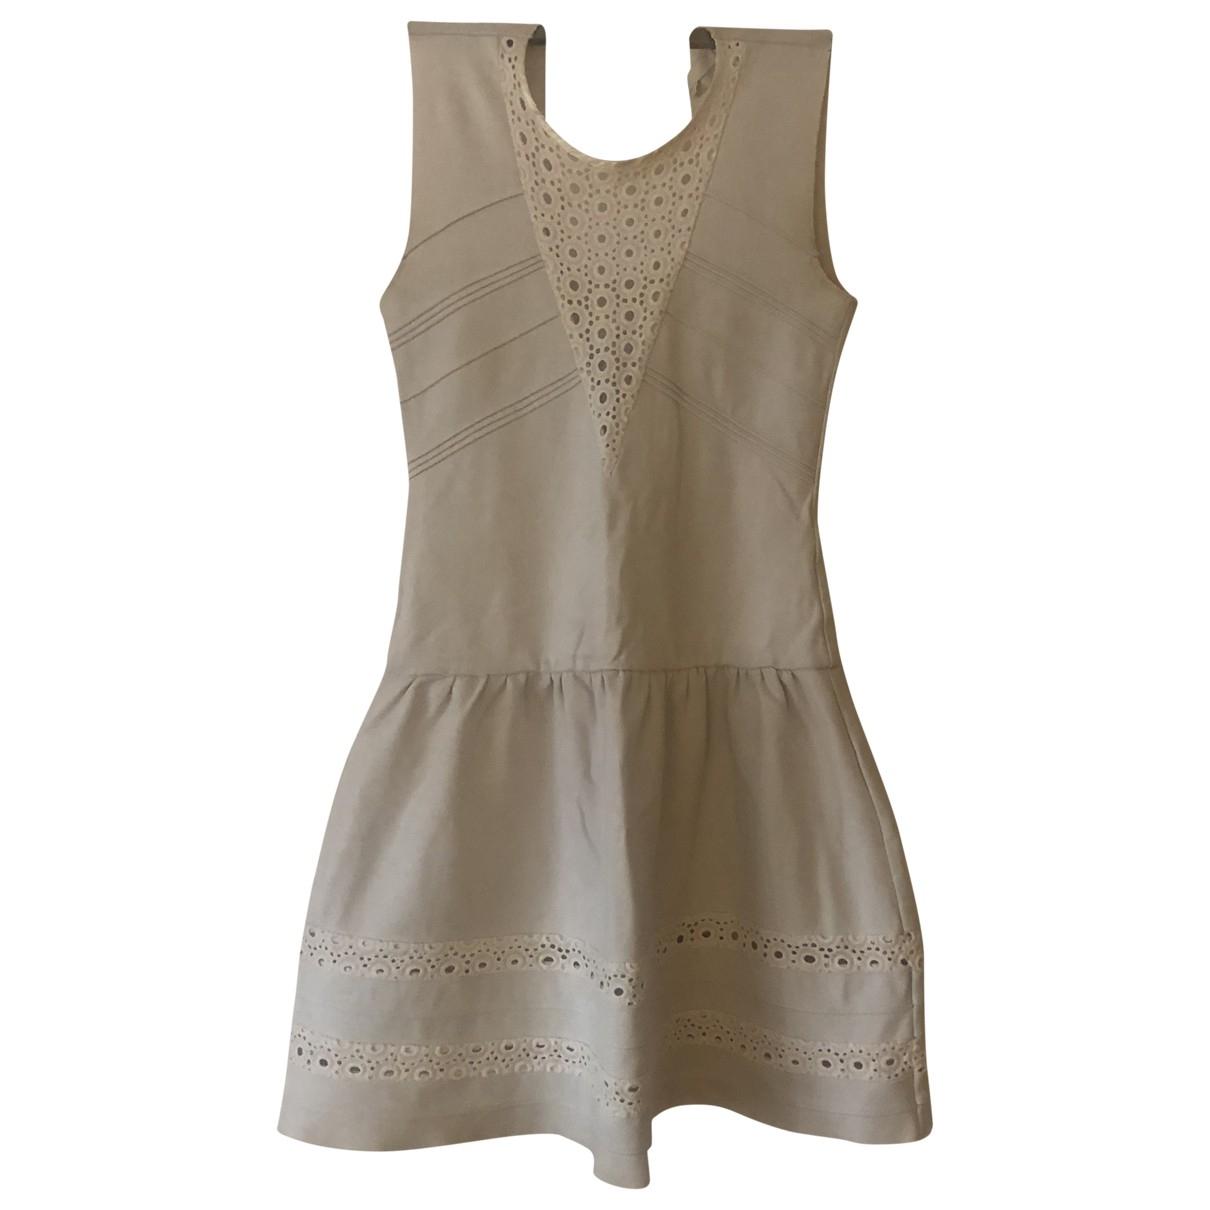 Maje \N White Cotton - elasthane dress for Women 1 0-5